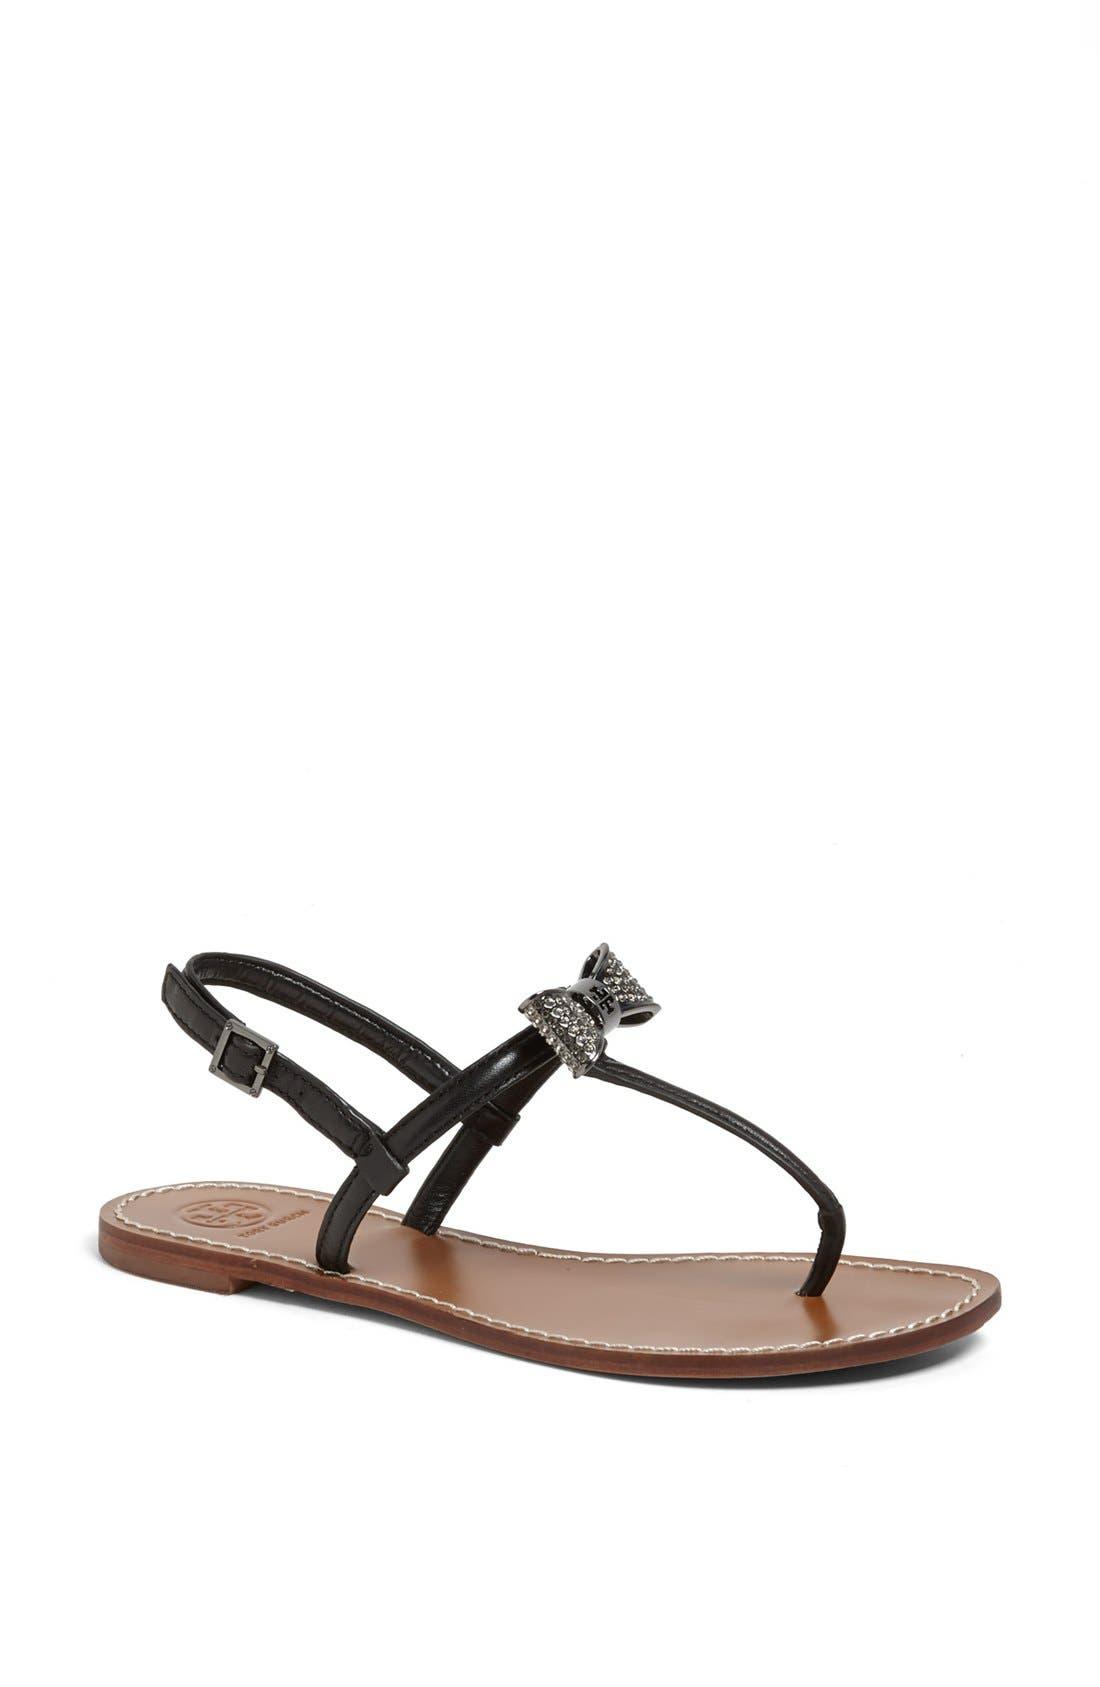 Main Image - Tory Burch 'Bryn' Sandal